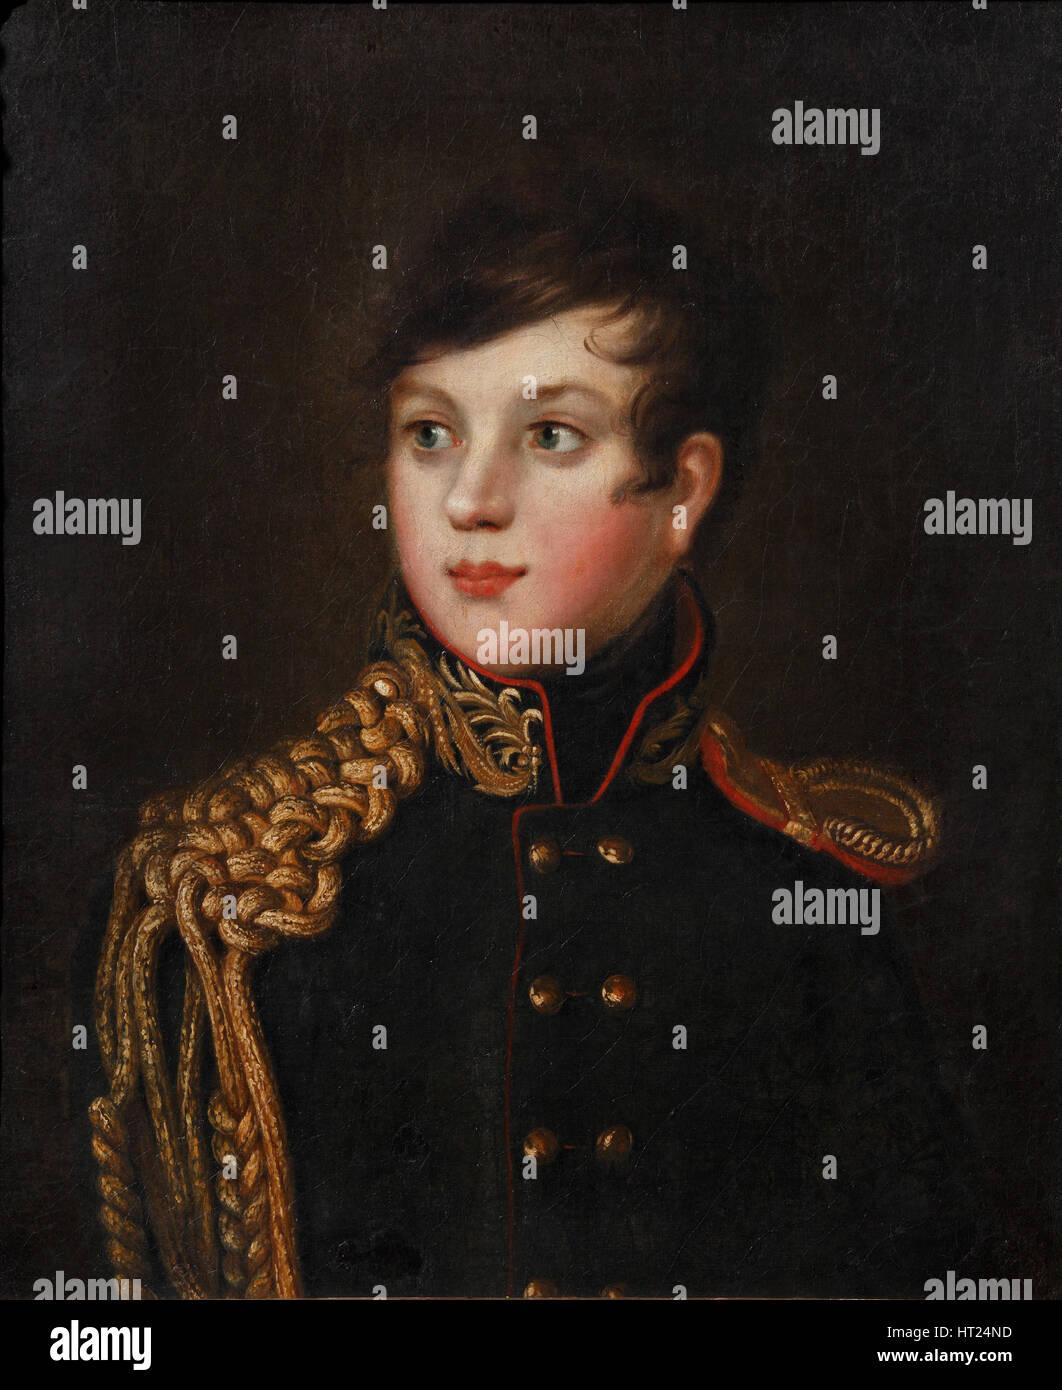 Portrait of Prince Alexander Pavlovich Stroganov (1795-1814), ca 1812. Artist: Svintsov, S.S. (active 1810s) - Stock Image